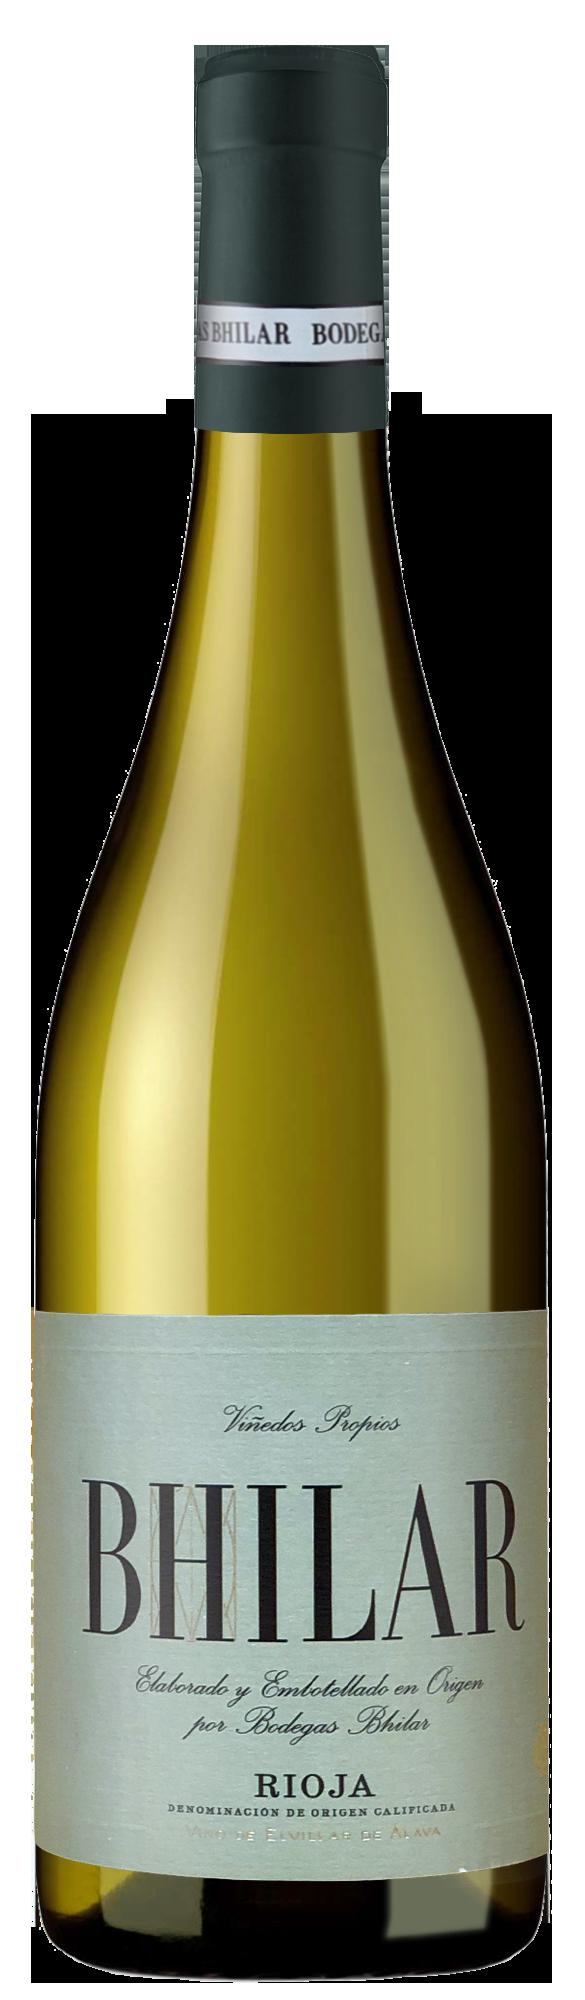 Bodegas Bhilar Rioja Blanco winewine магазин склад